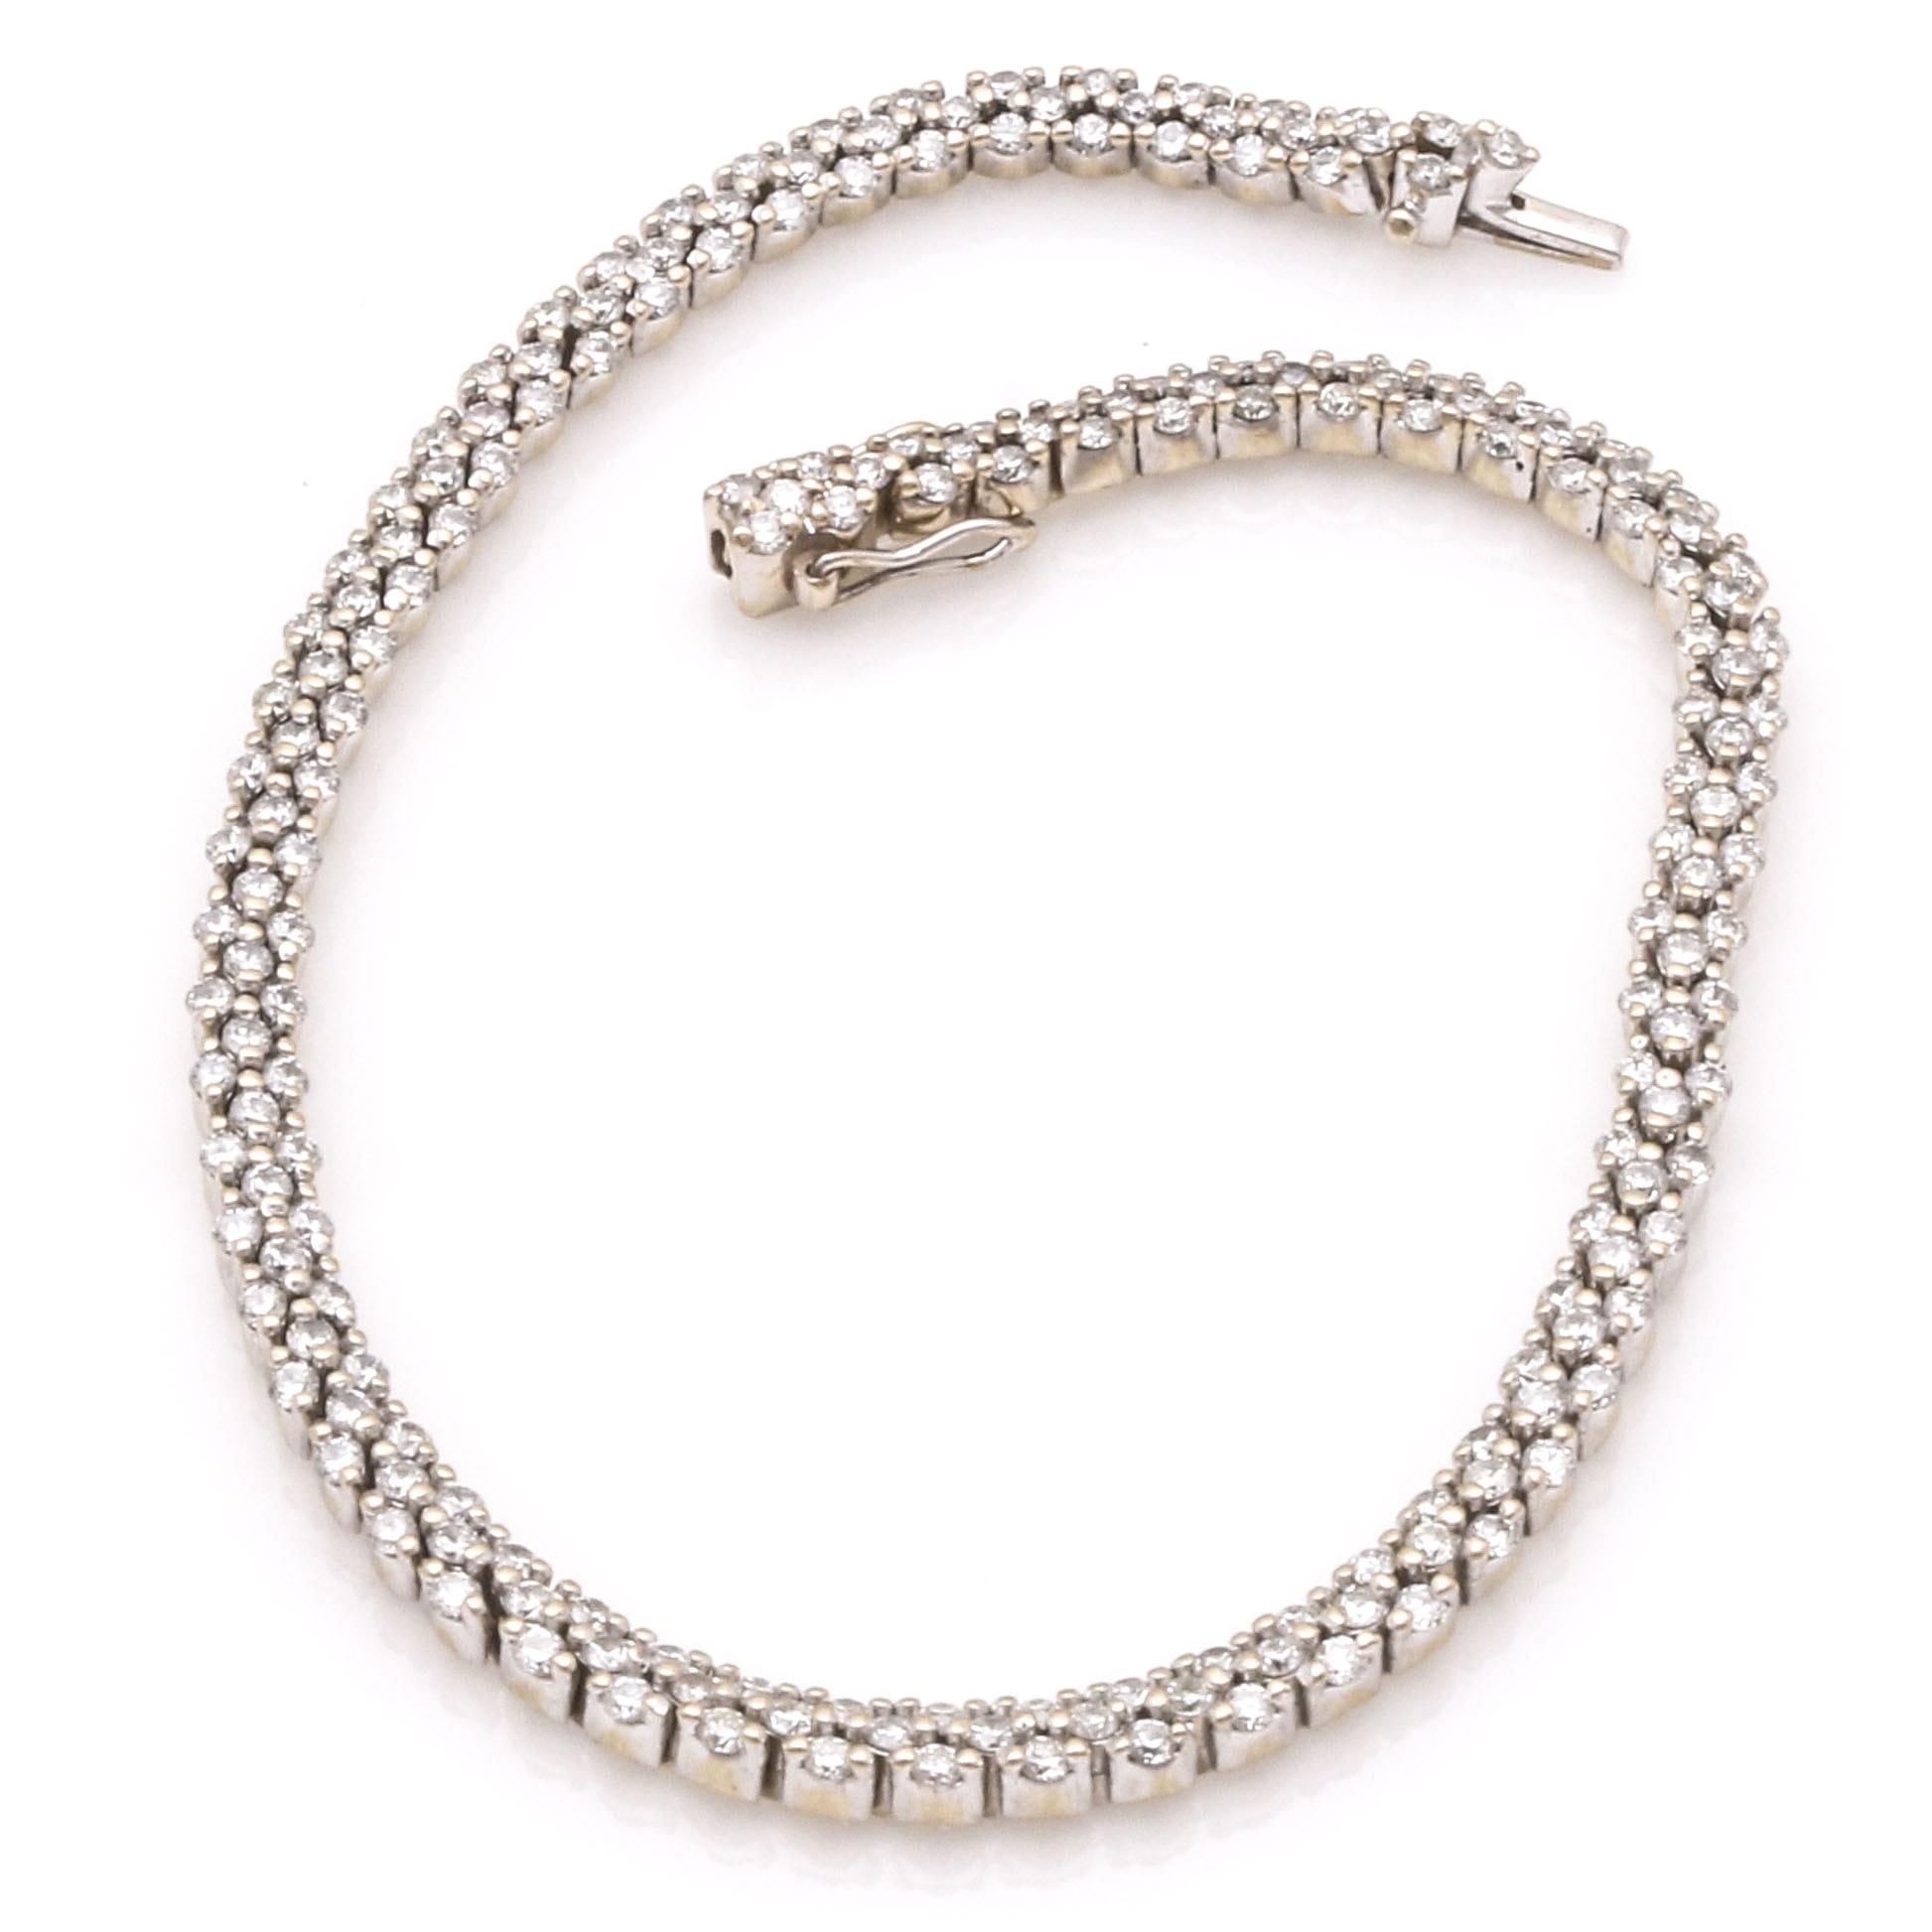 18K White Gold 2.48 CTW Diamond Tennis Bracelet